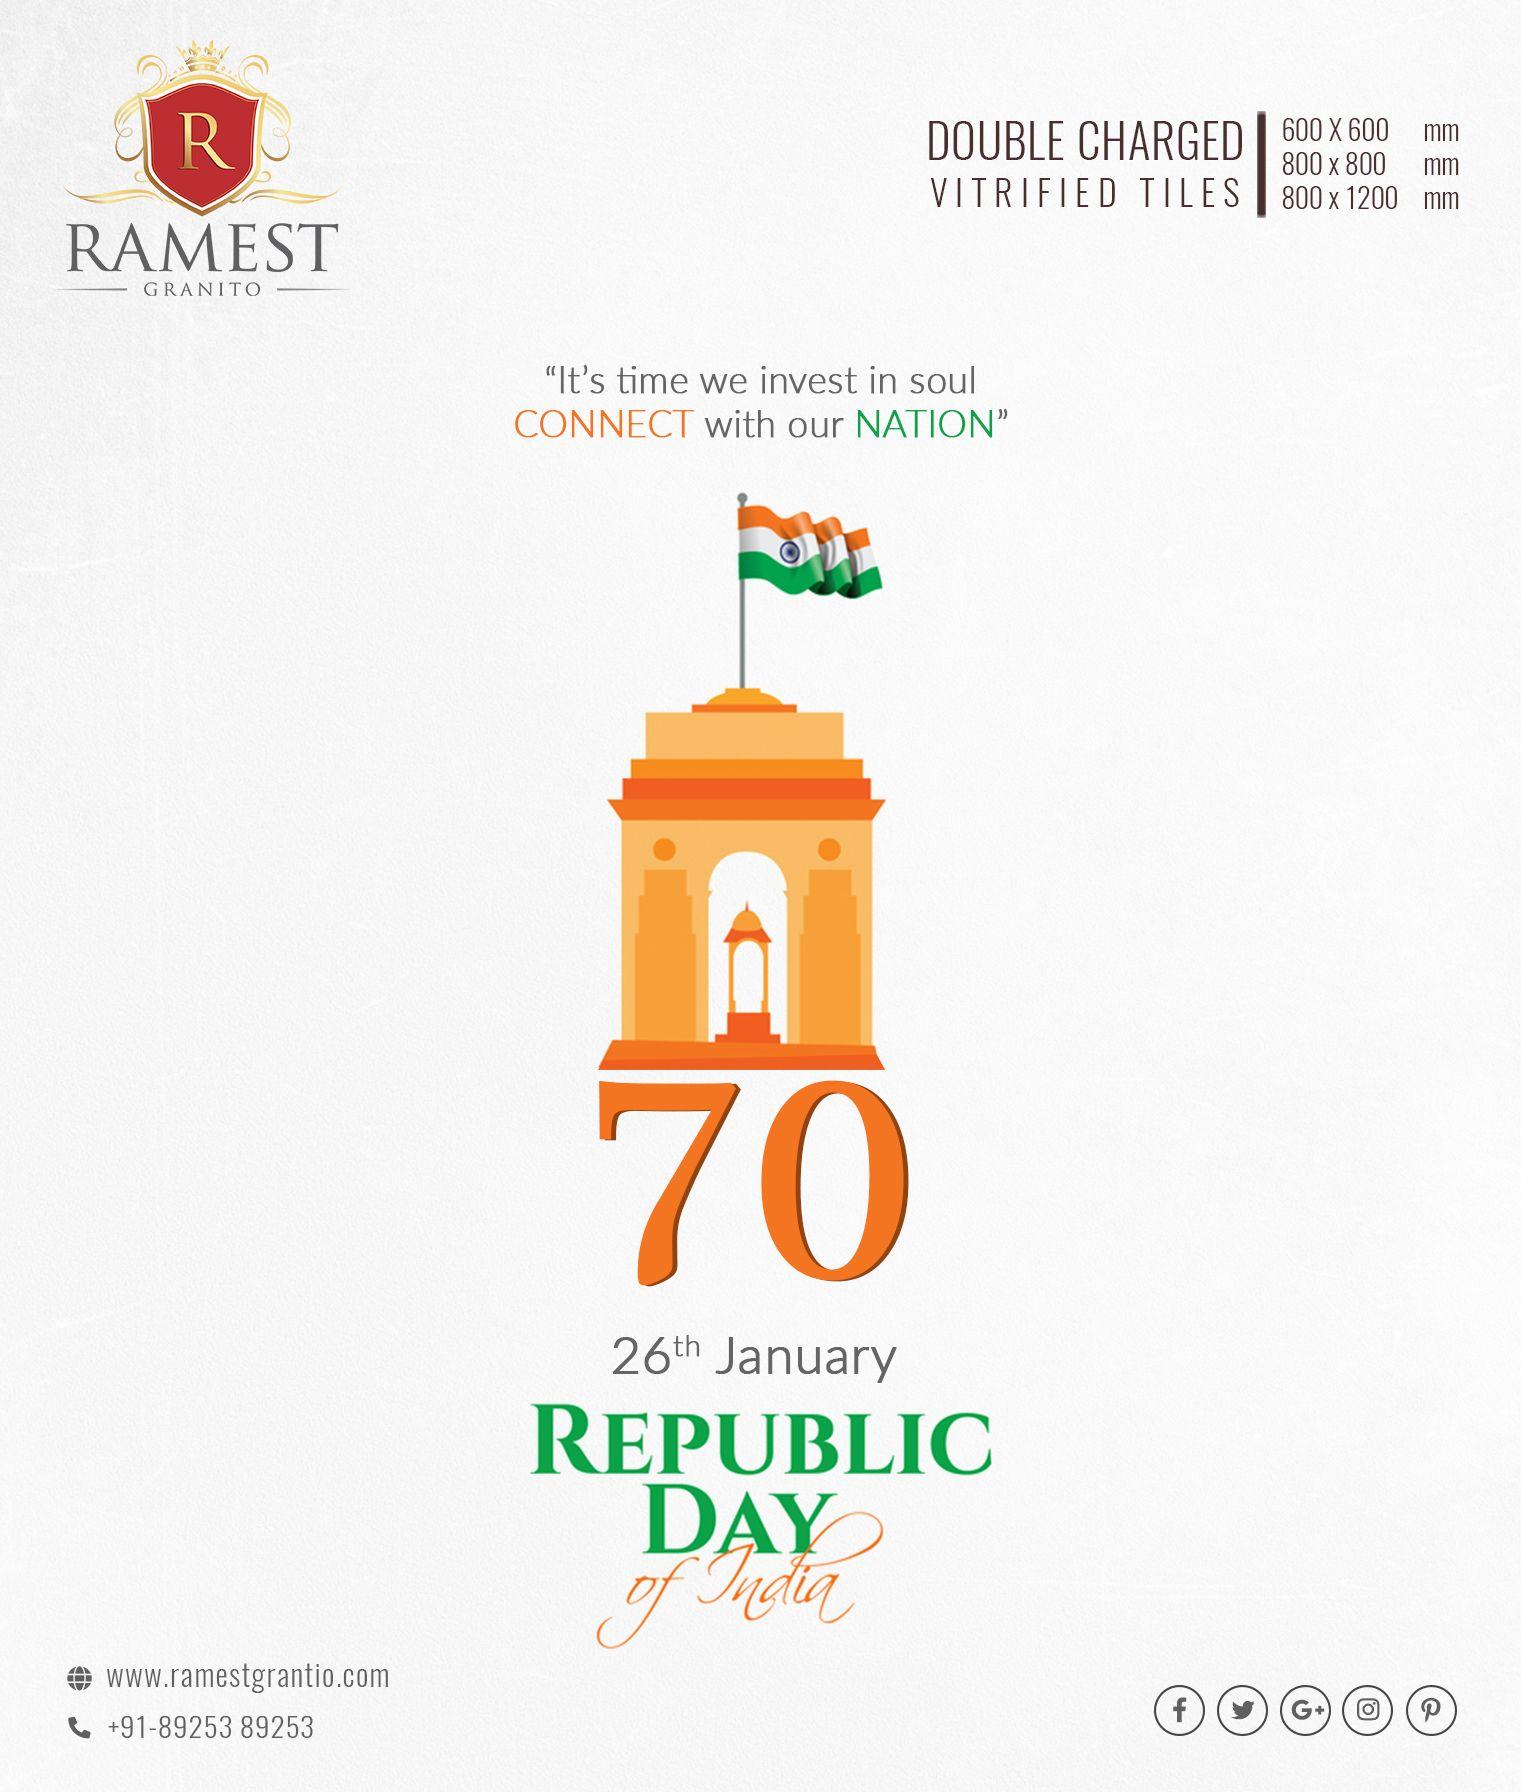 Ramest Granito Wishes You Happy Republic Day Happyrepublicday 26thjanuary India Republic Republicday Republic Day Republic Day Wishes Republic Day India